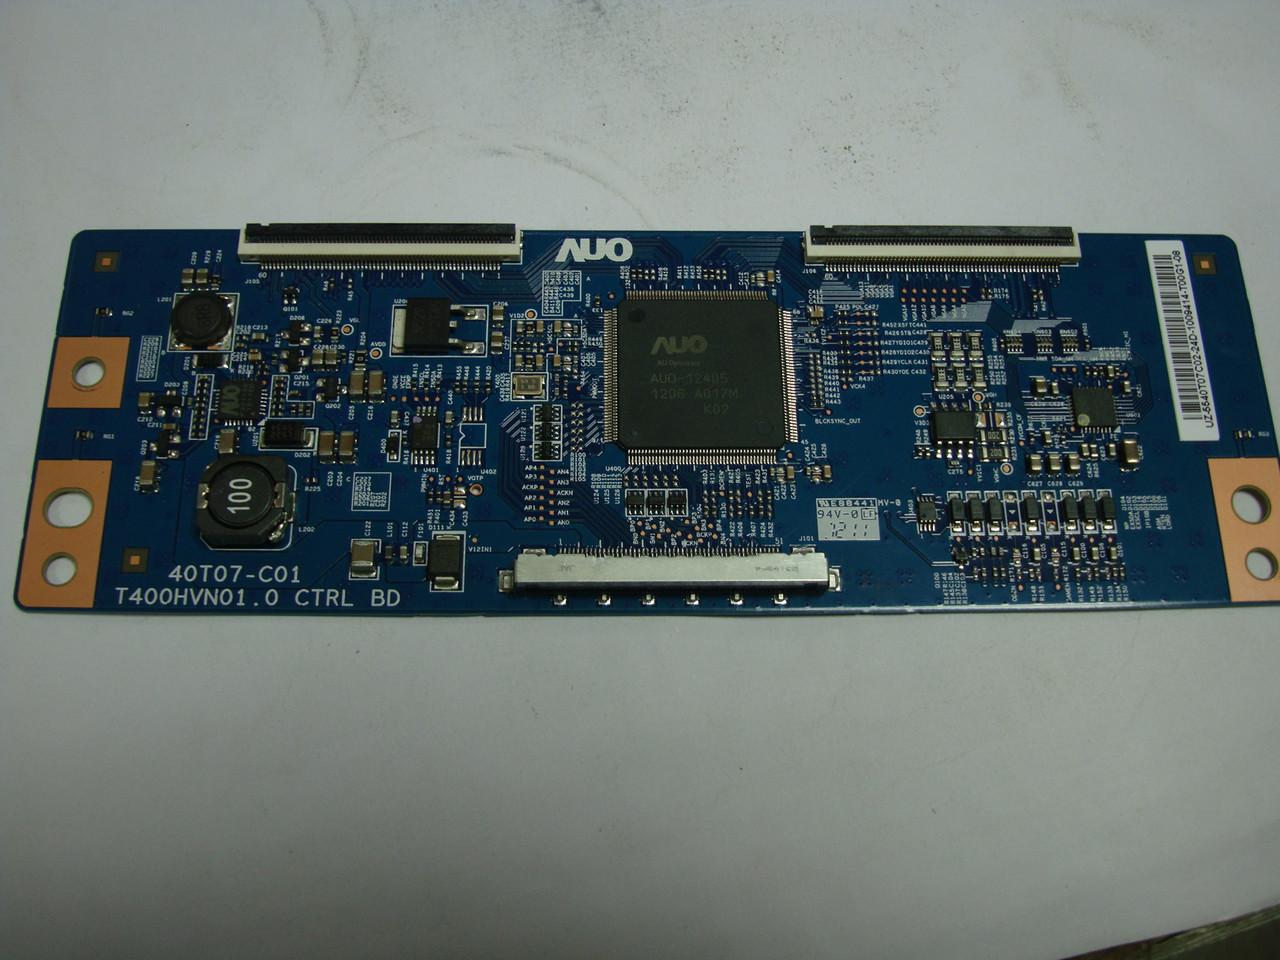 T-con T400HVN01.0 ctrl BD (40T07-C01)